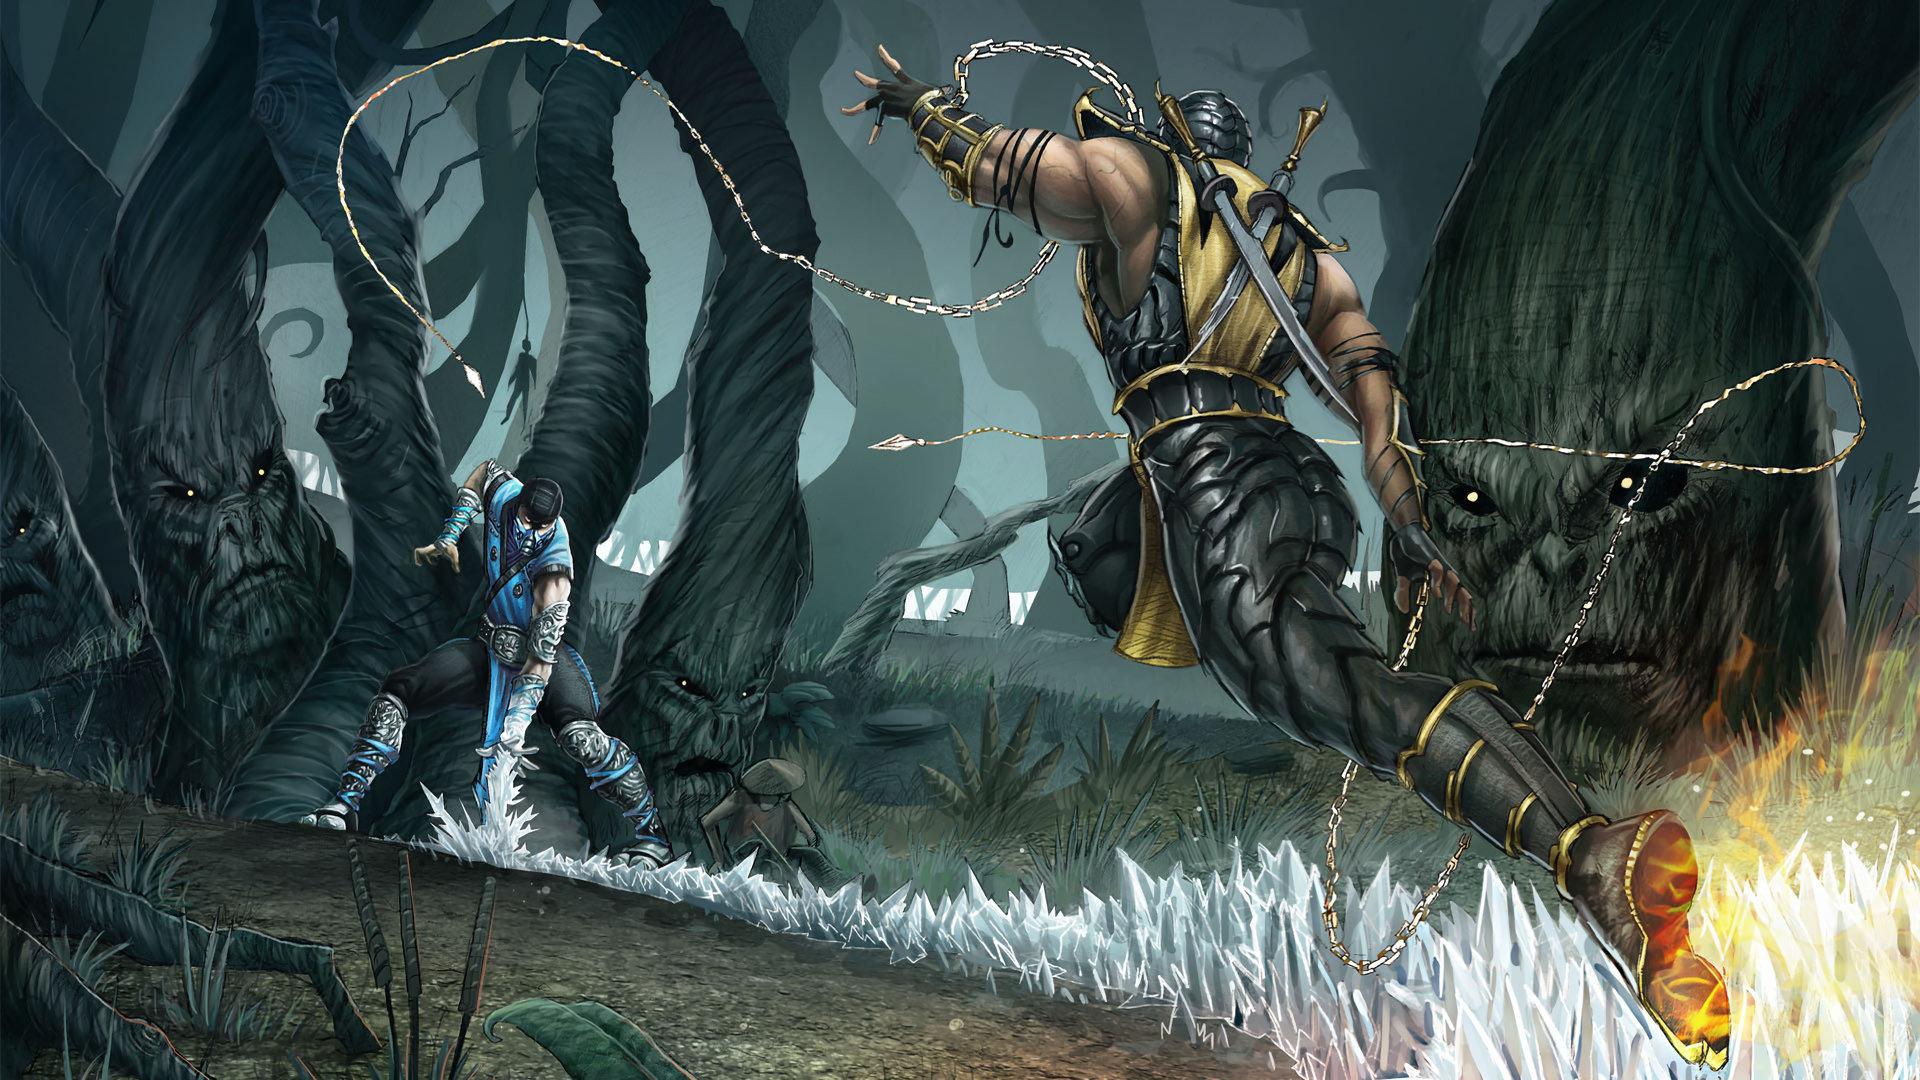 Sub Zero Mortal Kombat Wallpapers Hd For Desktop Backgrounds